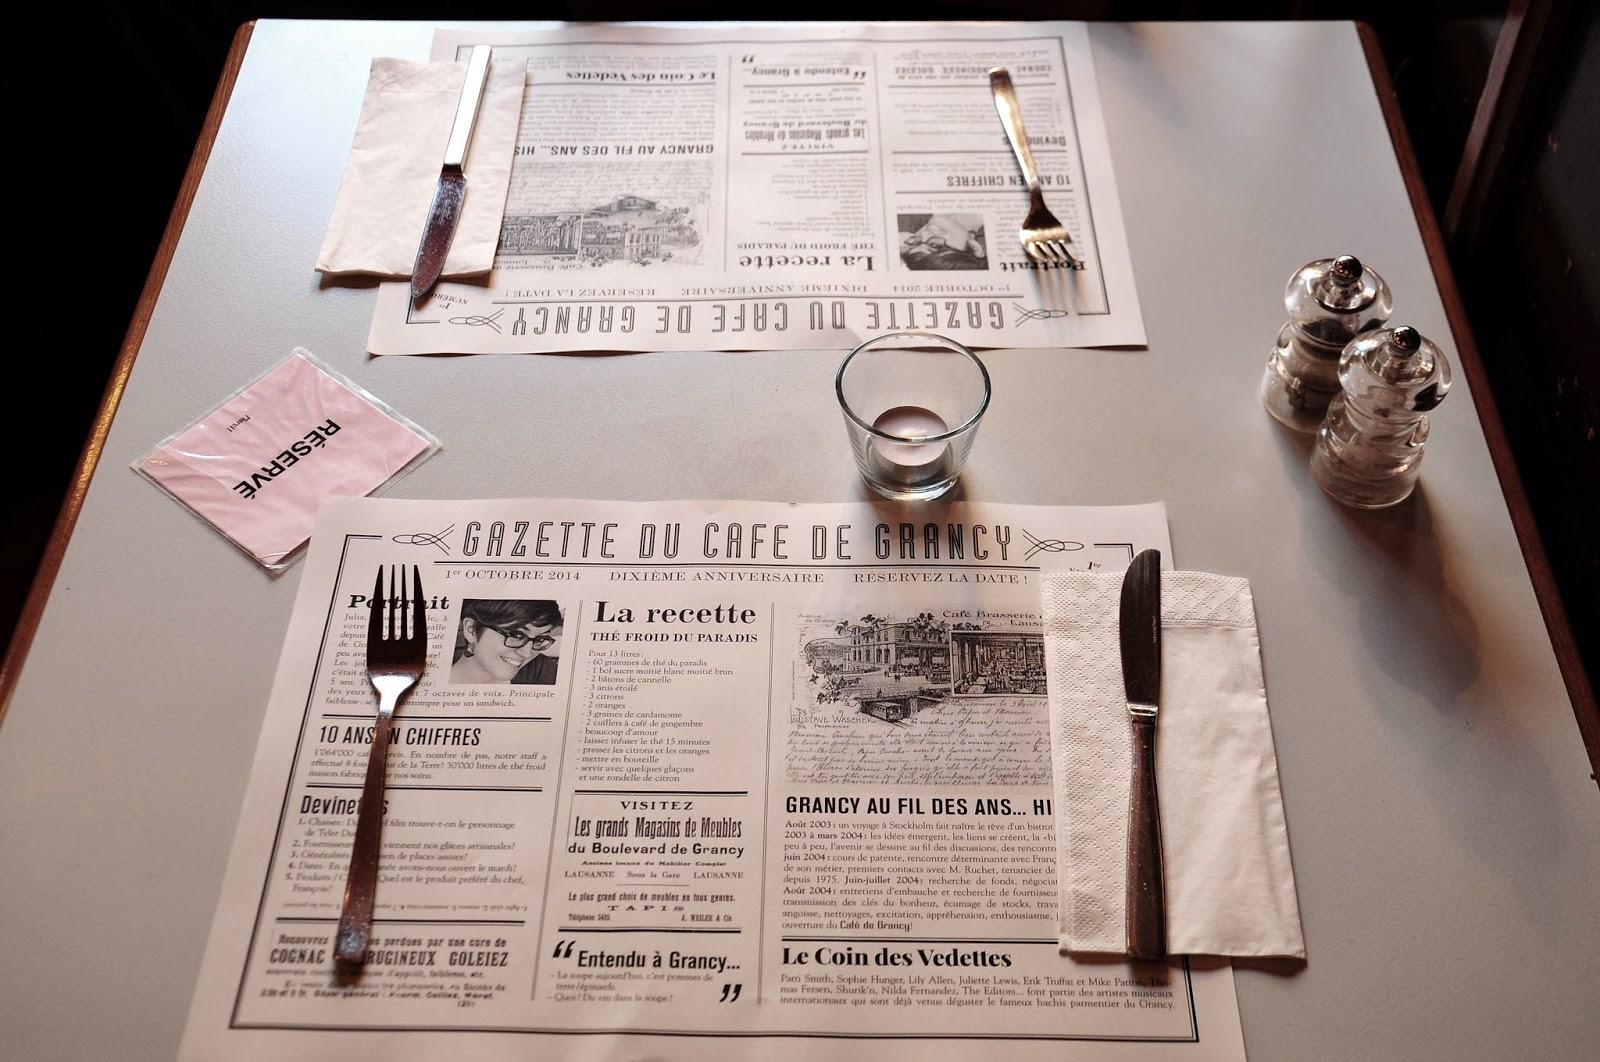 café grancy menu reserver